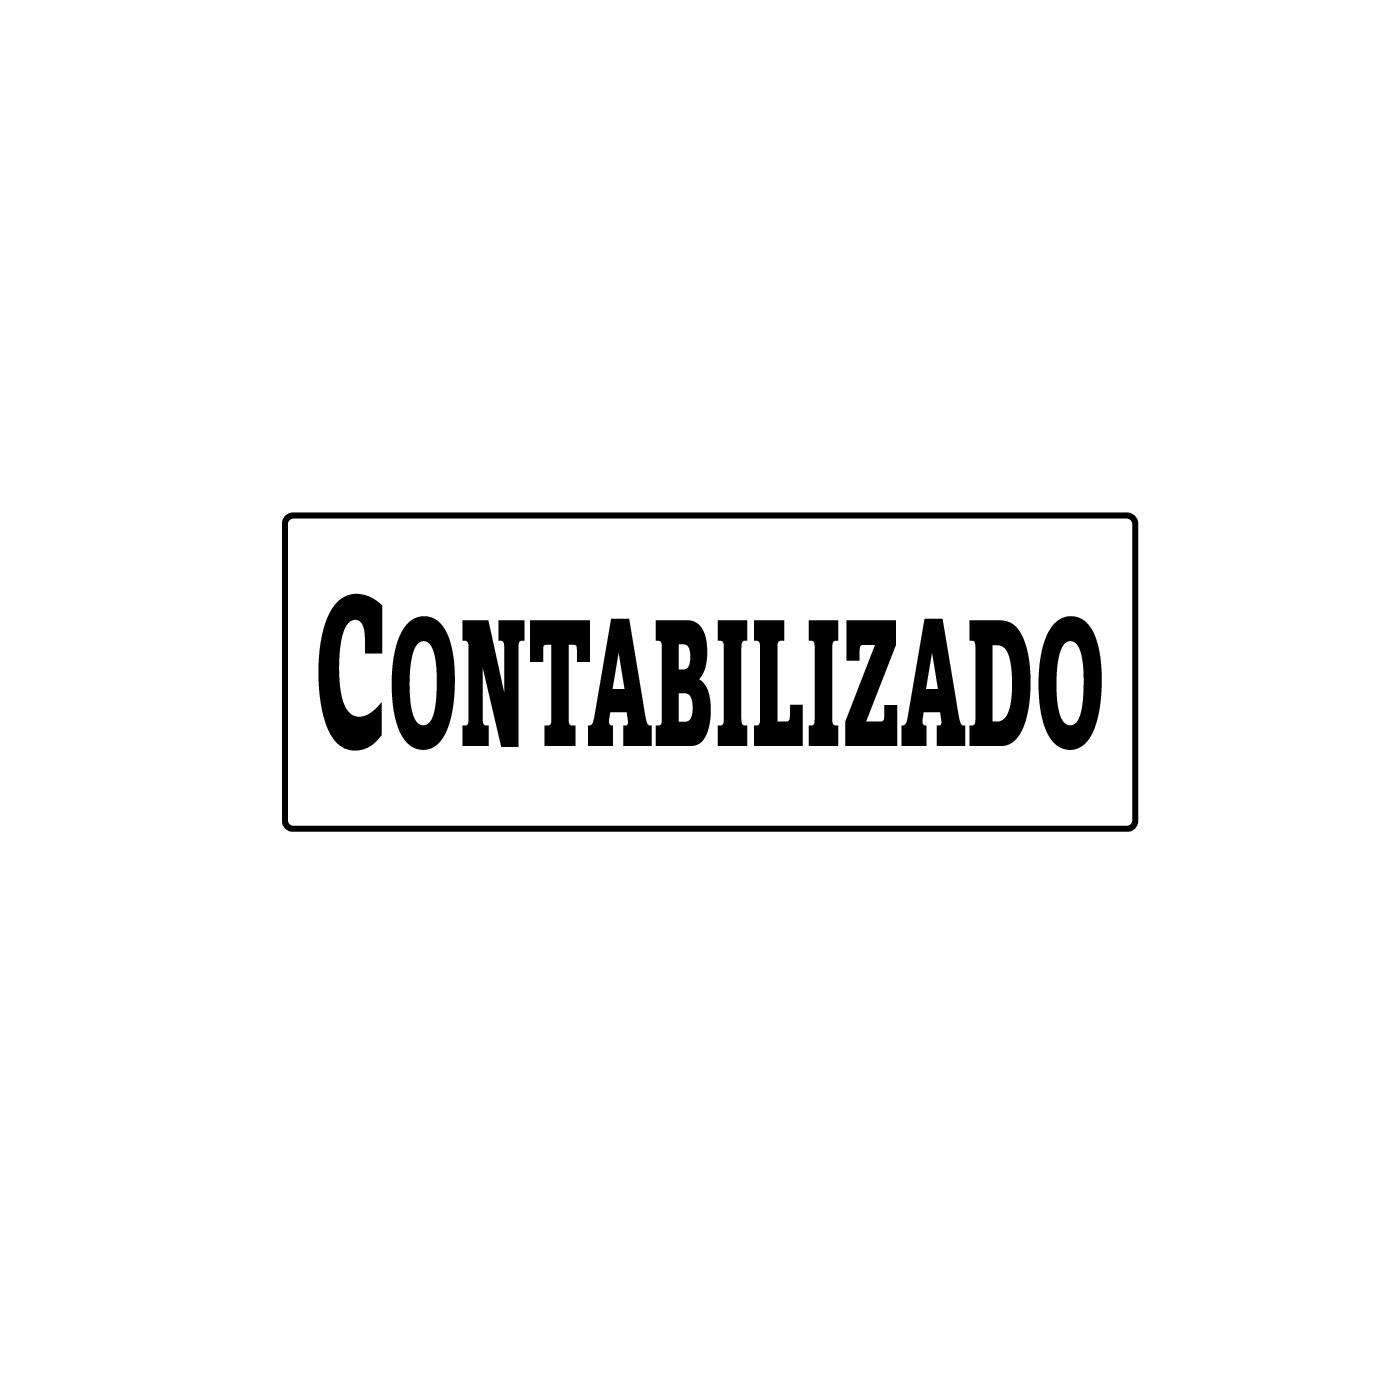 contabilizado-001